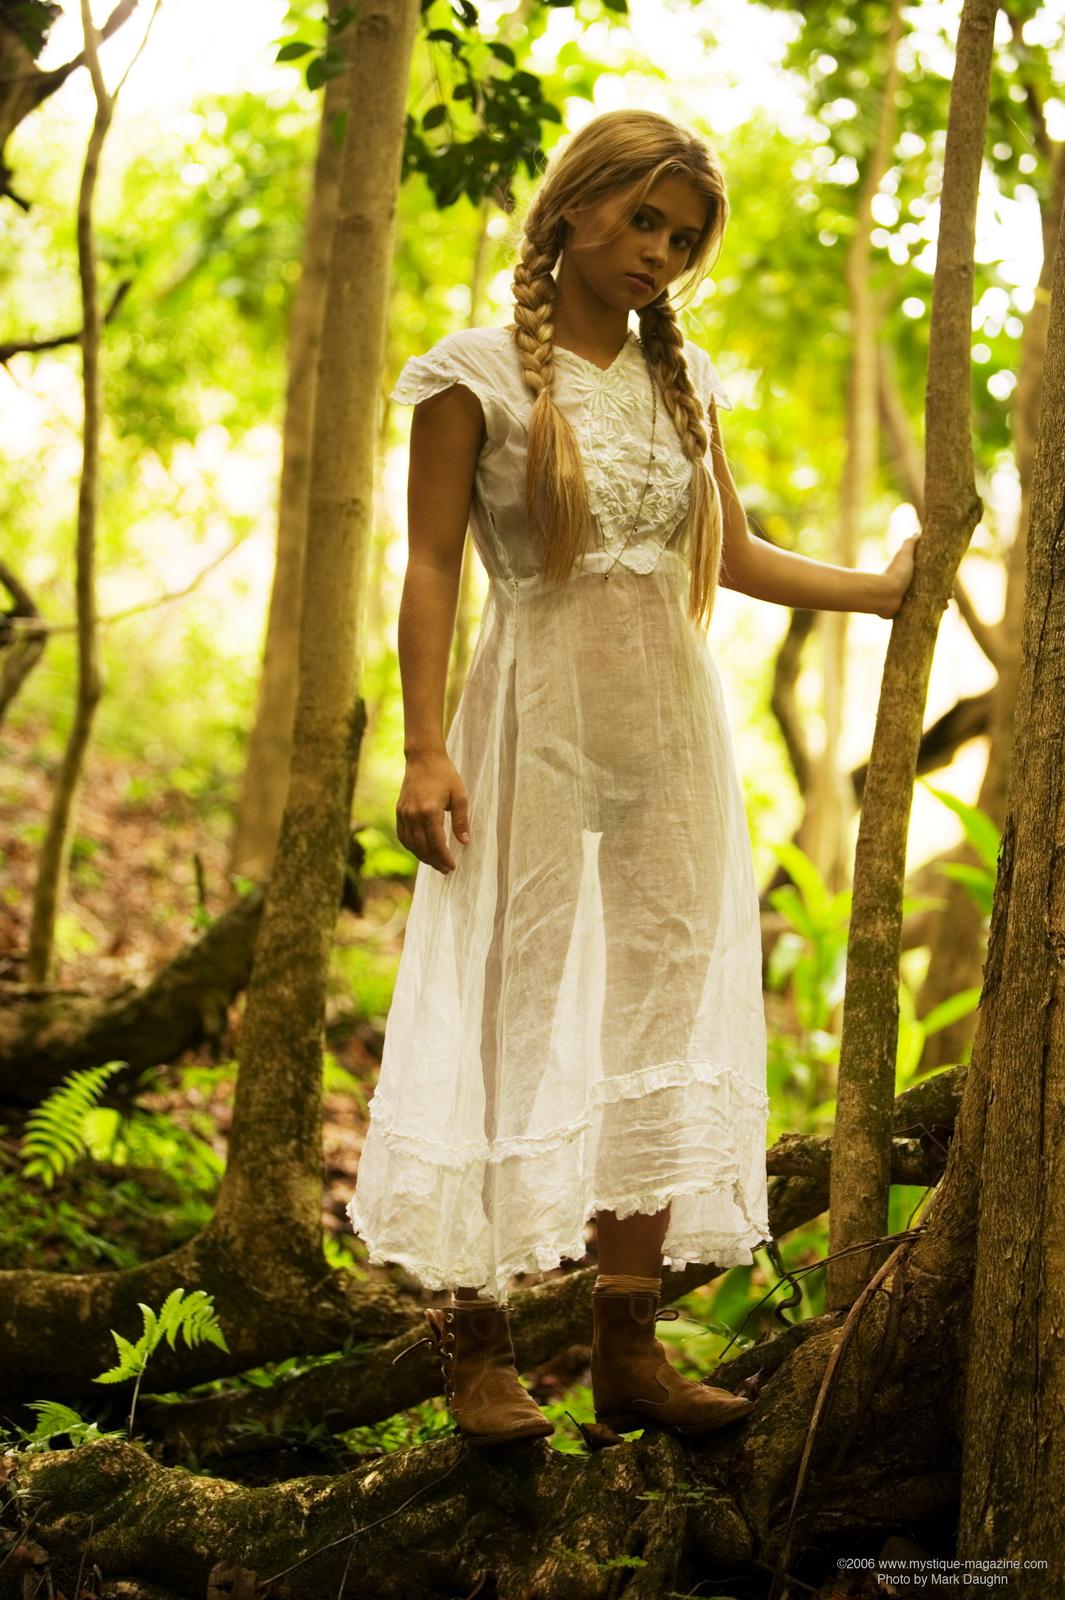 jannah-burnham-woods-blonde-pigtails-naked-mystique-magazine-03